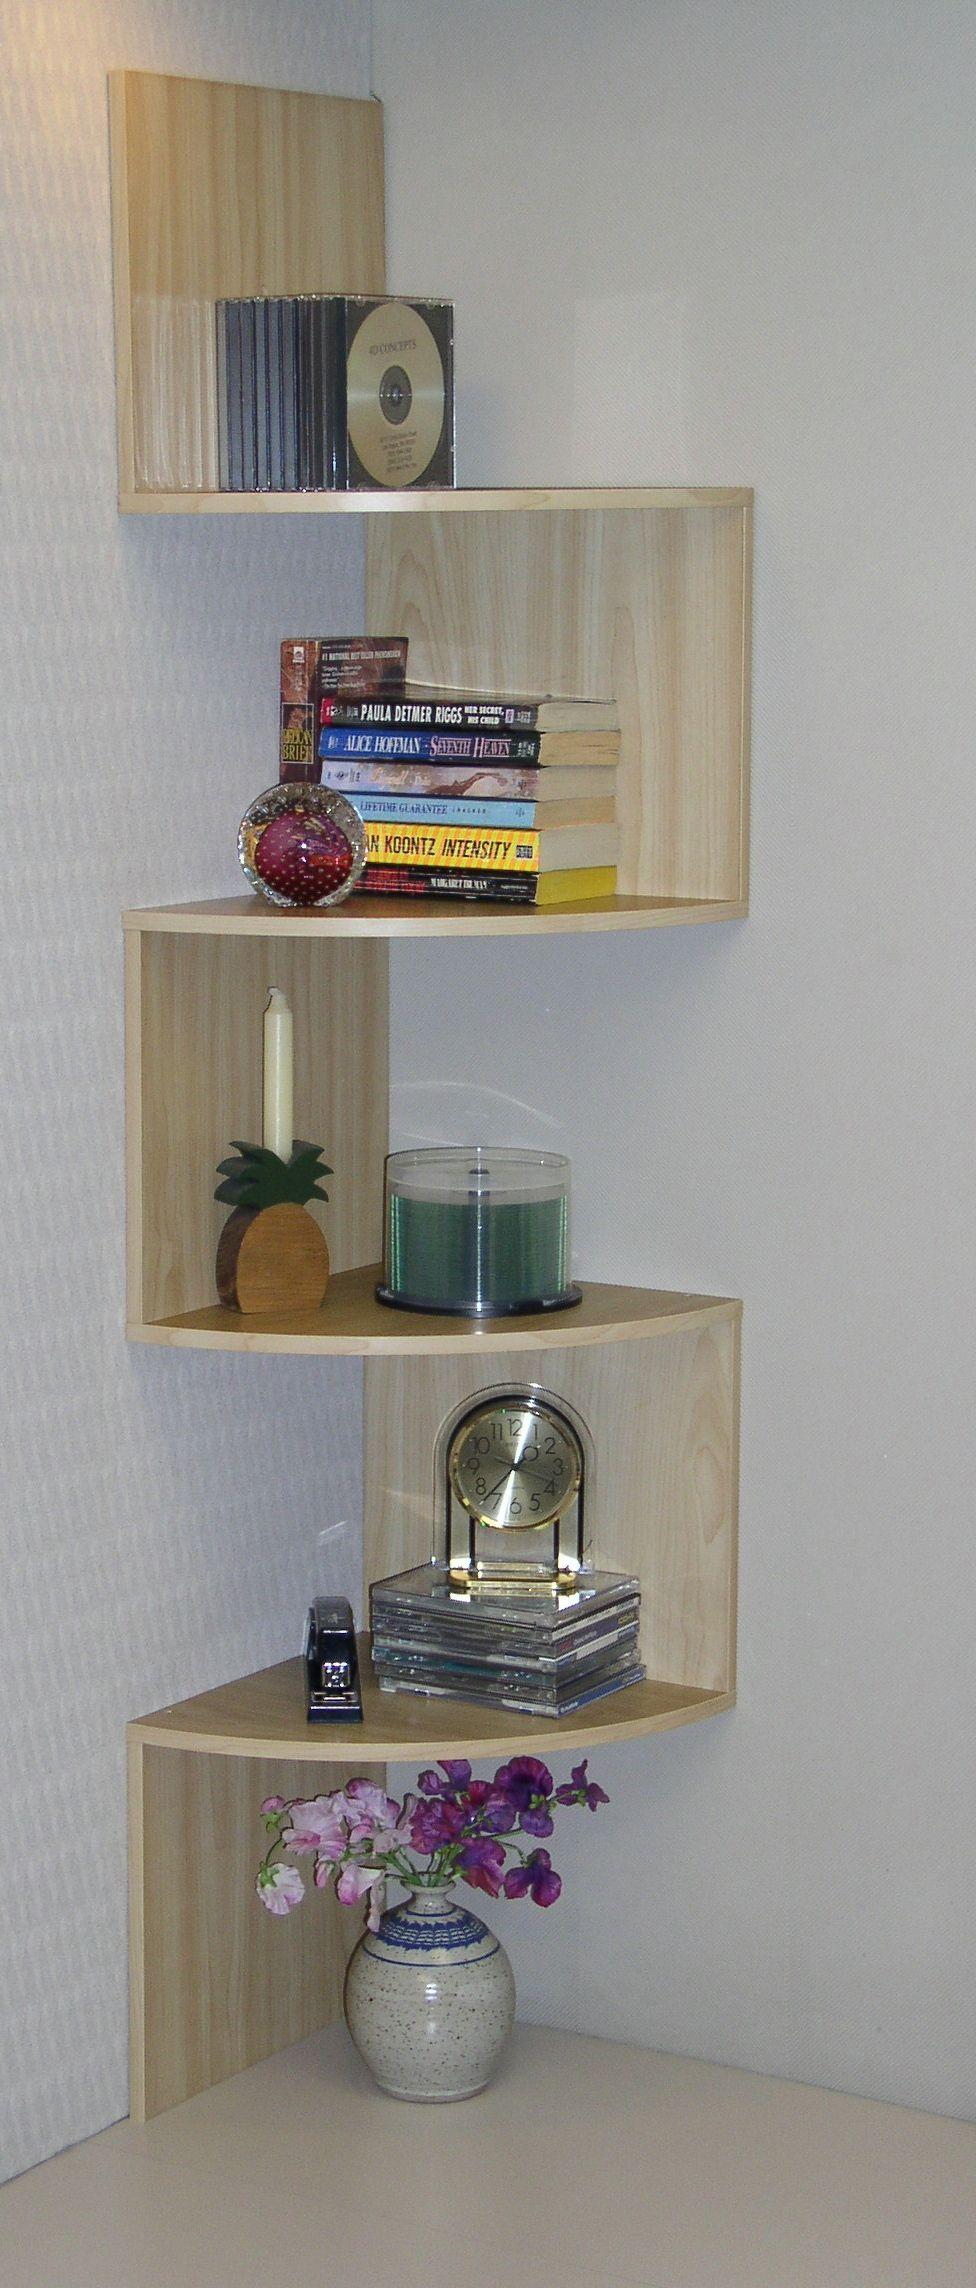 furniture-narrow-unit-shelving-glass-floating-hanging-wall-shelves-under-stairs-greenhouse-shelving-open-shelf-blue-track-wicker-shelving-unit-microwave-shelf-cool-bookshelves-black-wall-adding-furniture.jpg (976×2288)